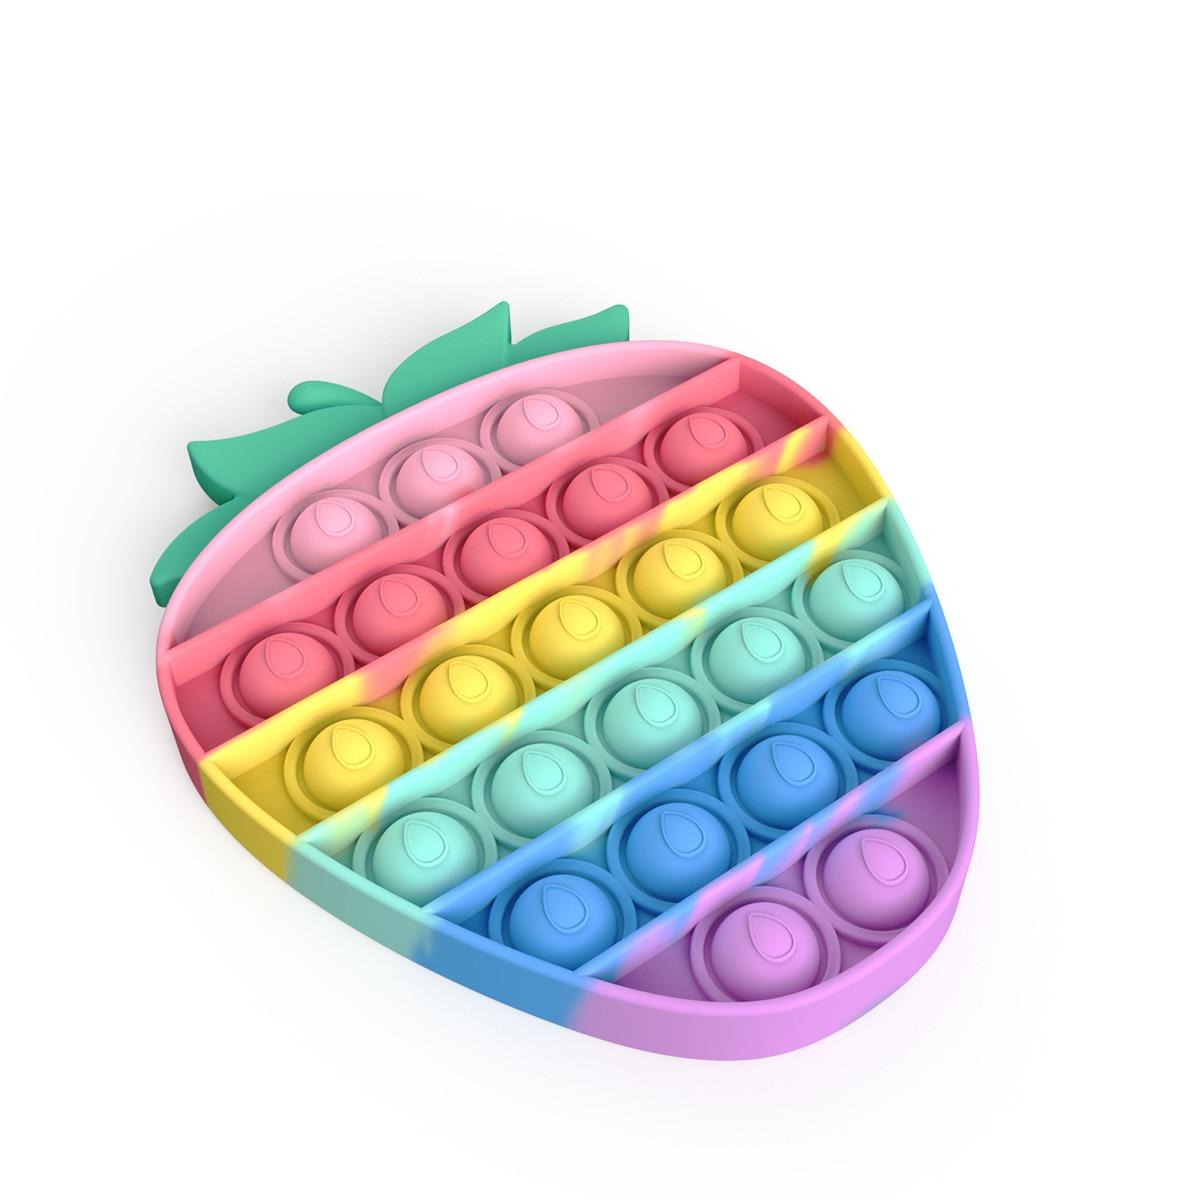 Push Pop Bubble Sensory Toy Autism Needs Squishy Stress Reliever Toys Anti-stress Pop It Fidget Strawberry Pineapple Rainbow Toy img4